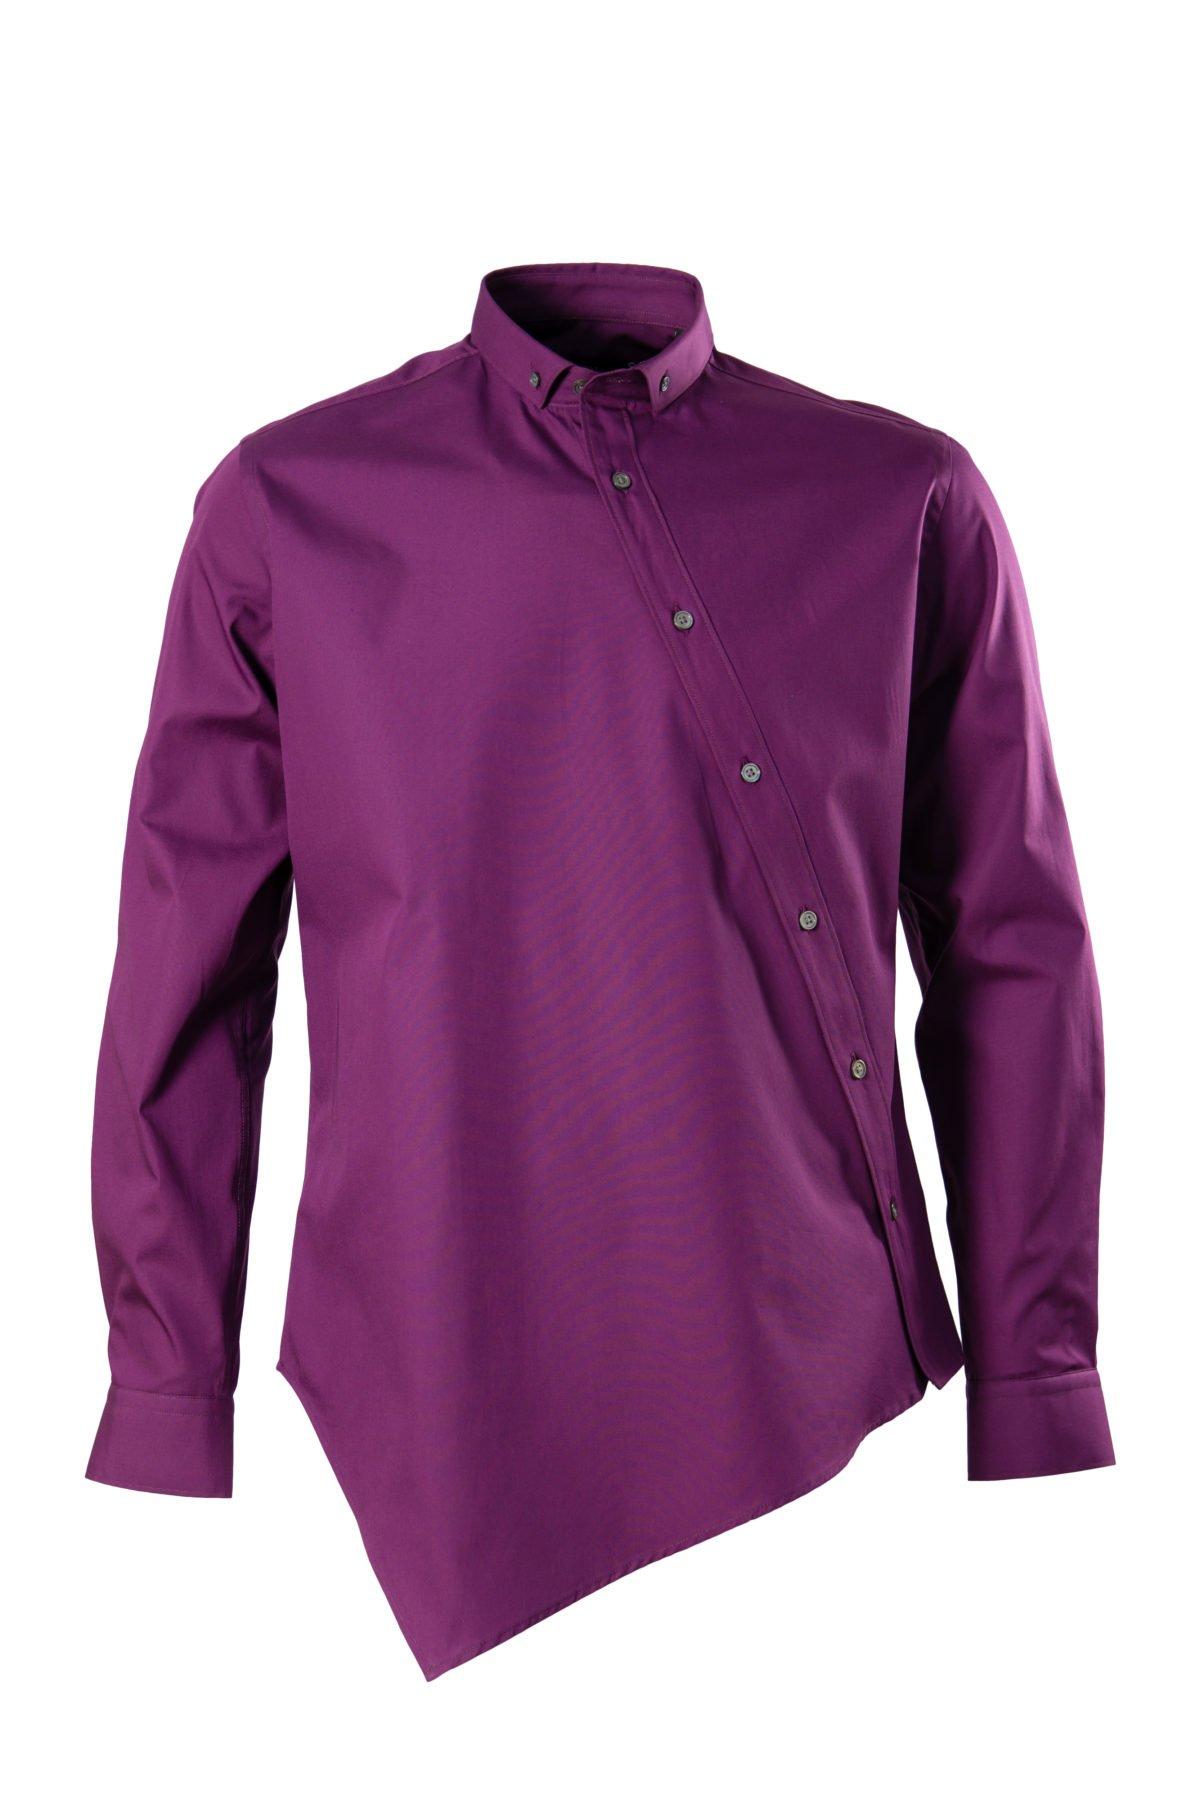 Camasa lilac asimetrica pe tipar SLIM FIT